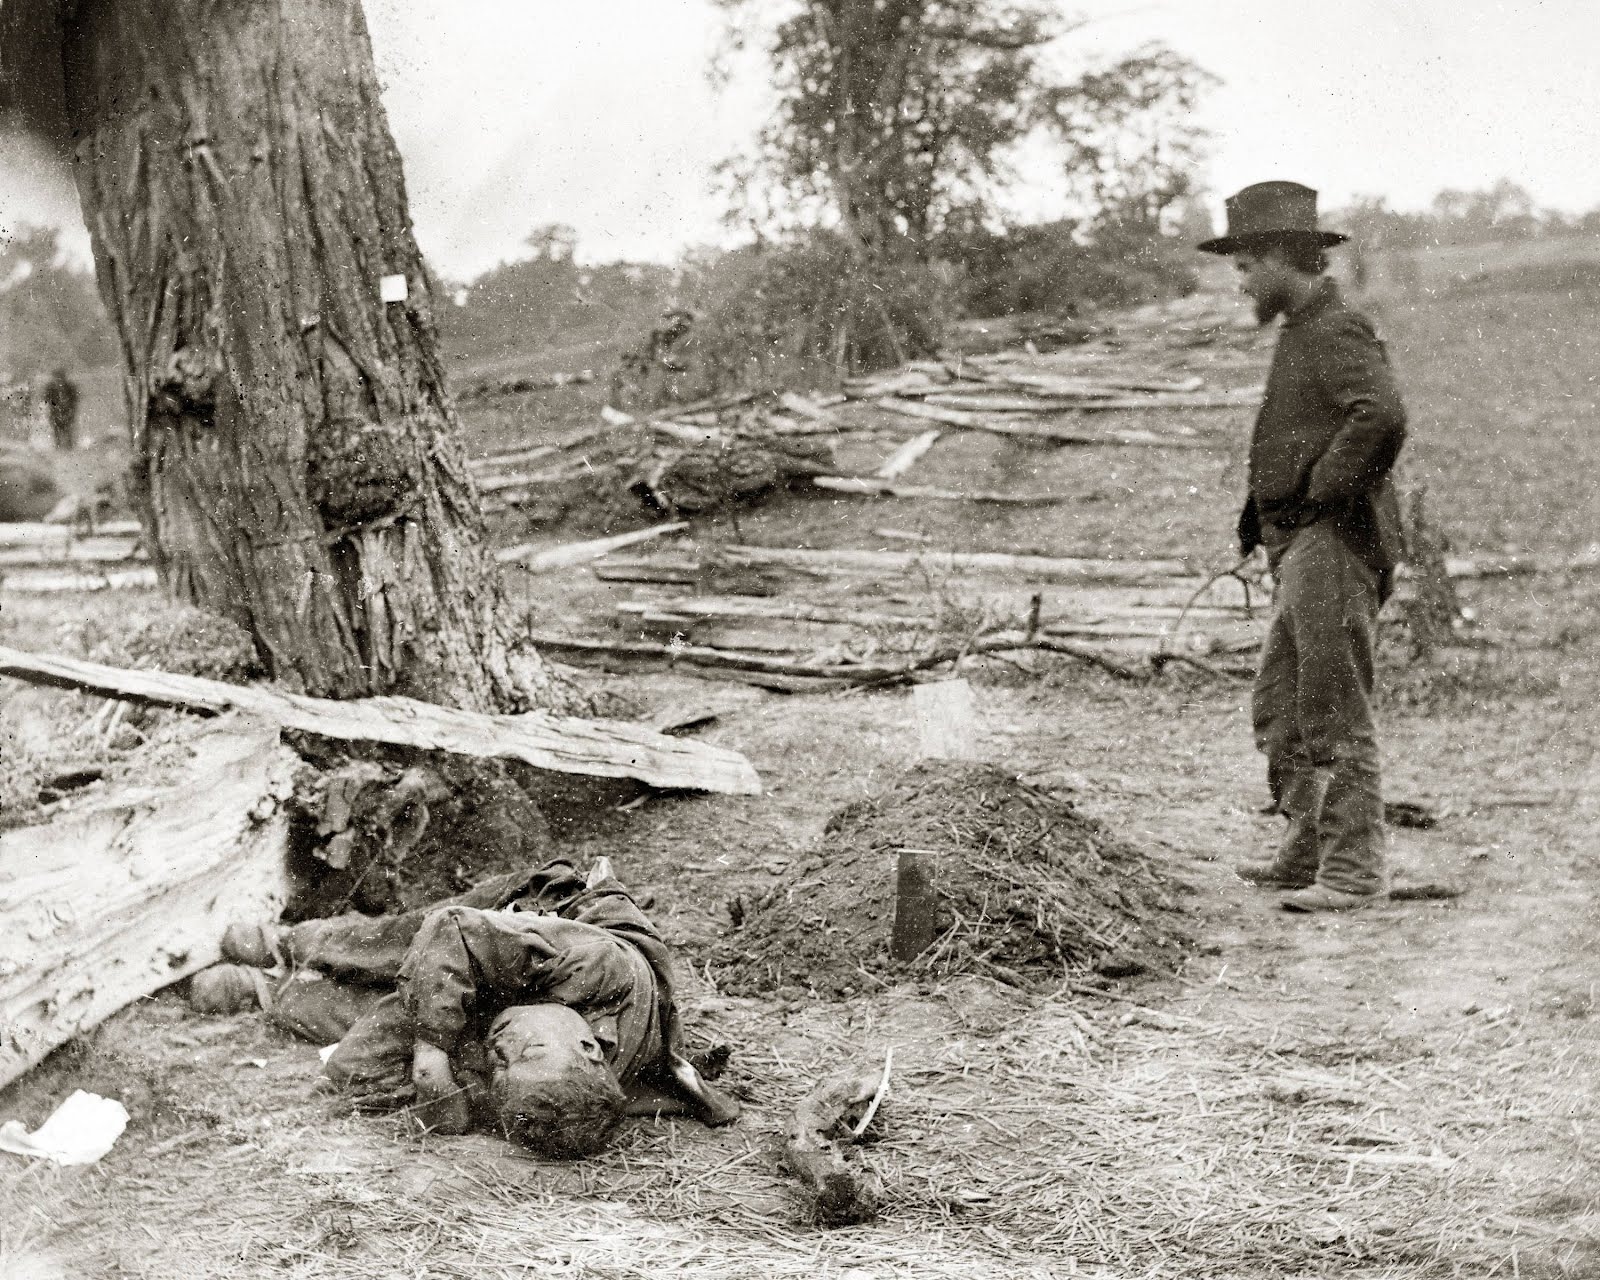 Alexander Gardner,  Federal Buried, Confederate Unburied ,   photograph at Antietam battlefield,  September 1863.